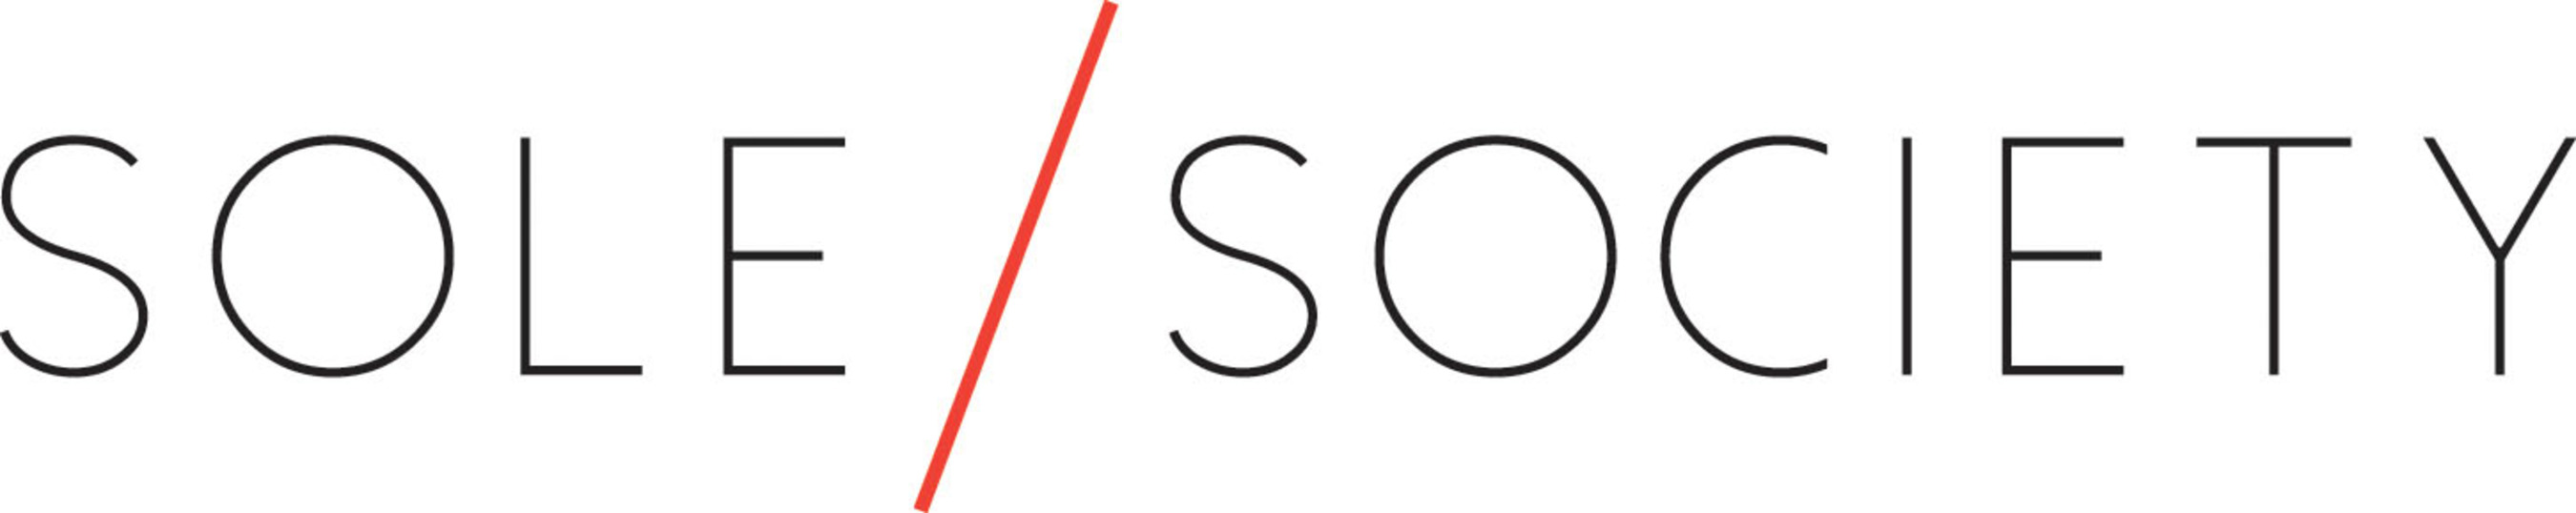 Sole Society www.solesociety.com.